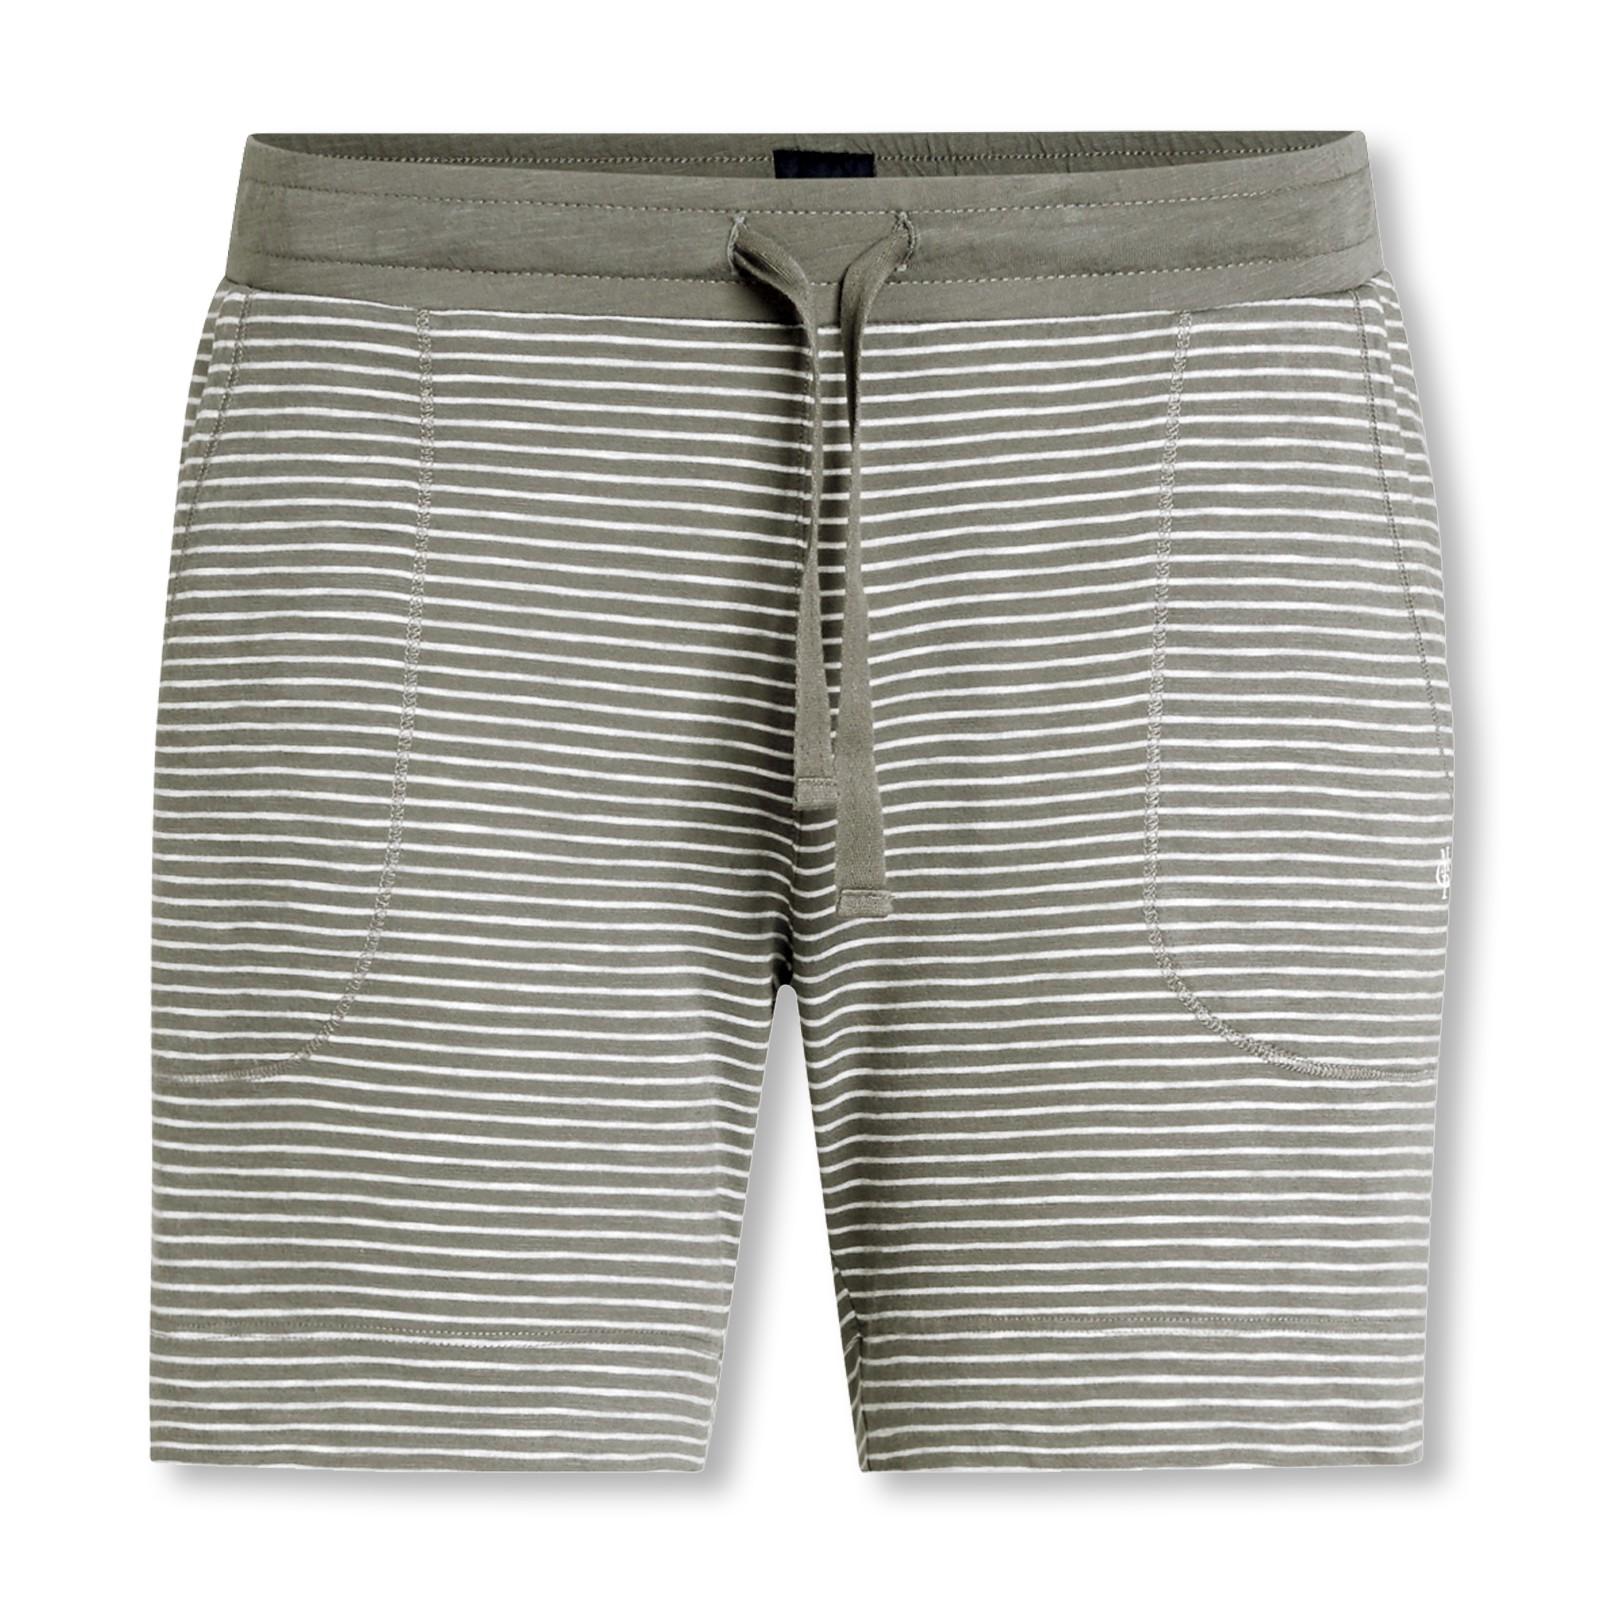 Marc O'Polo Damen Pyjamahose Shorty Schlafanzughose kurz 152767 S M L XL in olivgreen